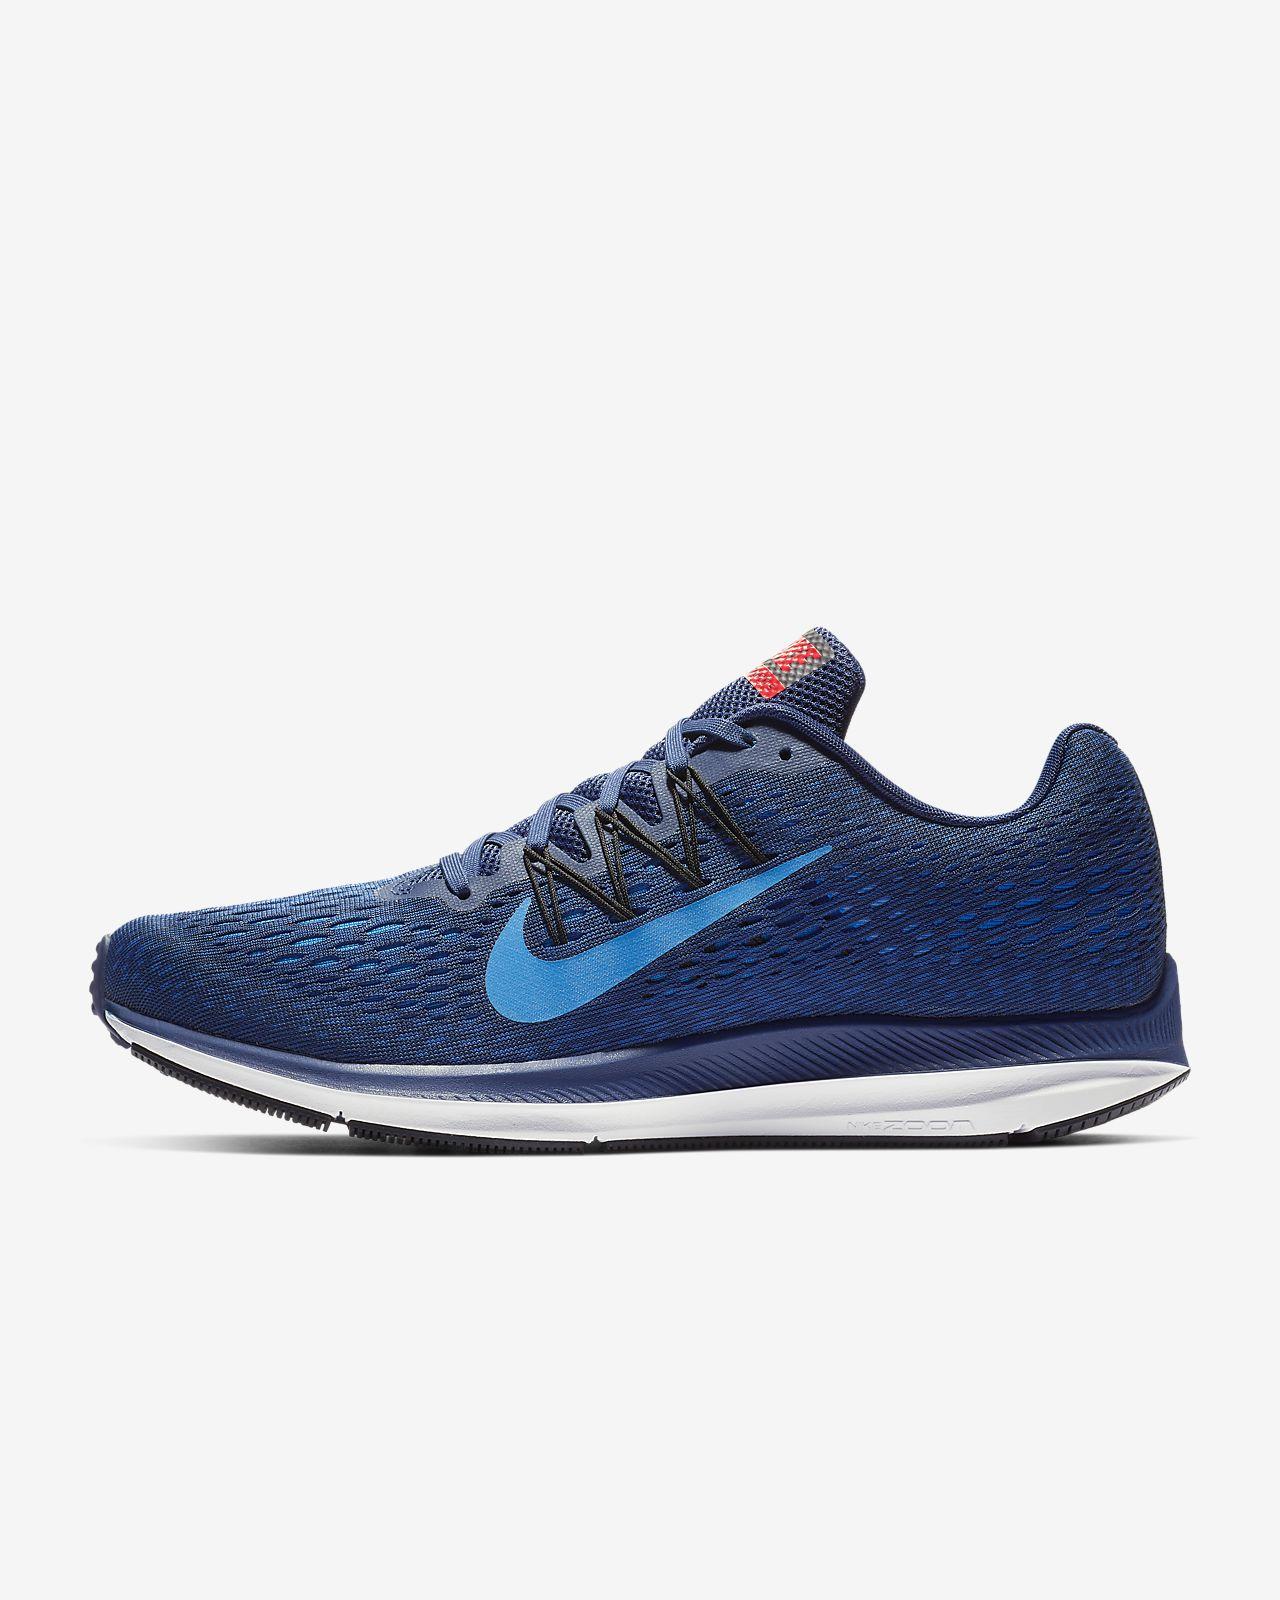 Nike Air Zoom Winflo 5 Men s Running Shoe. Nike.com ec5bc1086a70